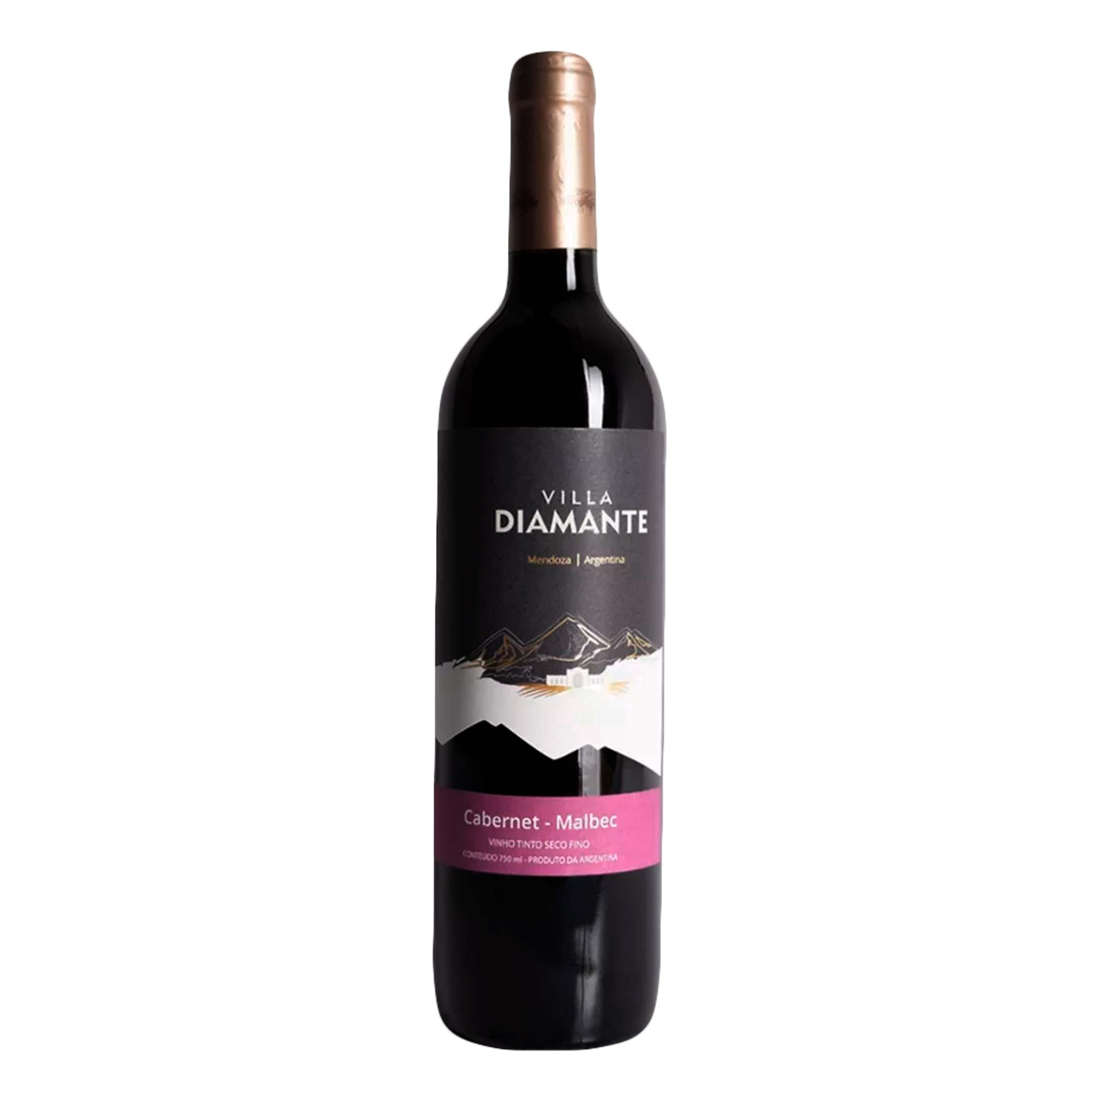 Vinho Villa Diamante Cabernet - Malbec 750 ml